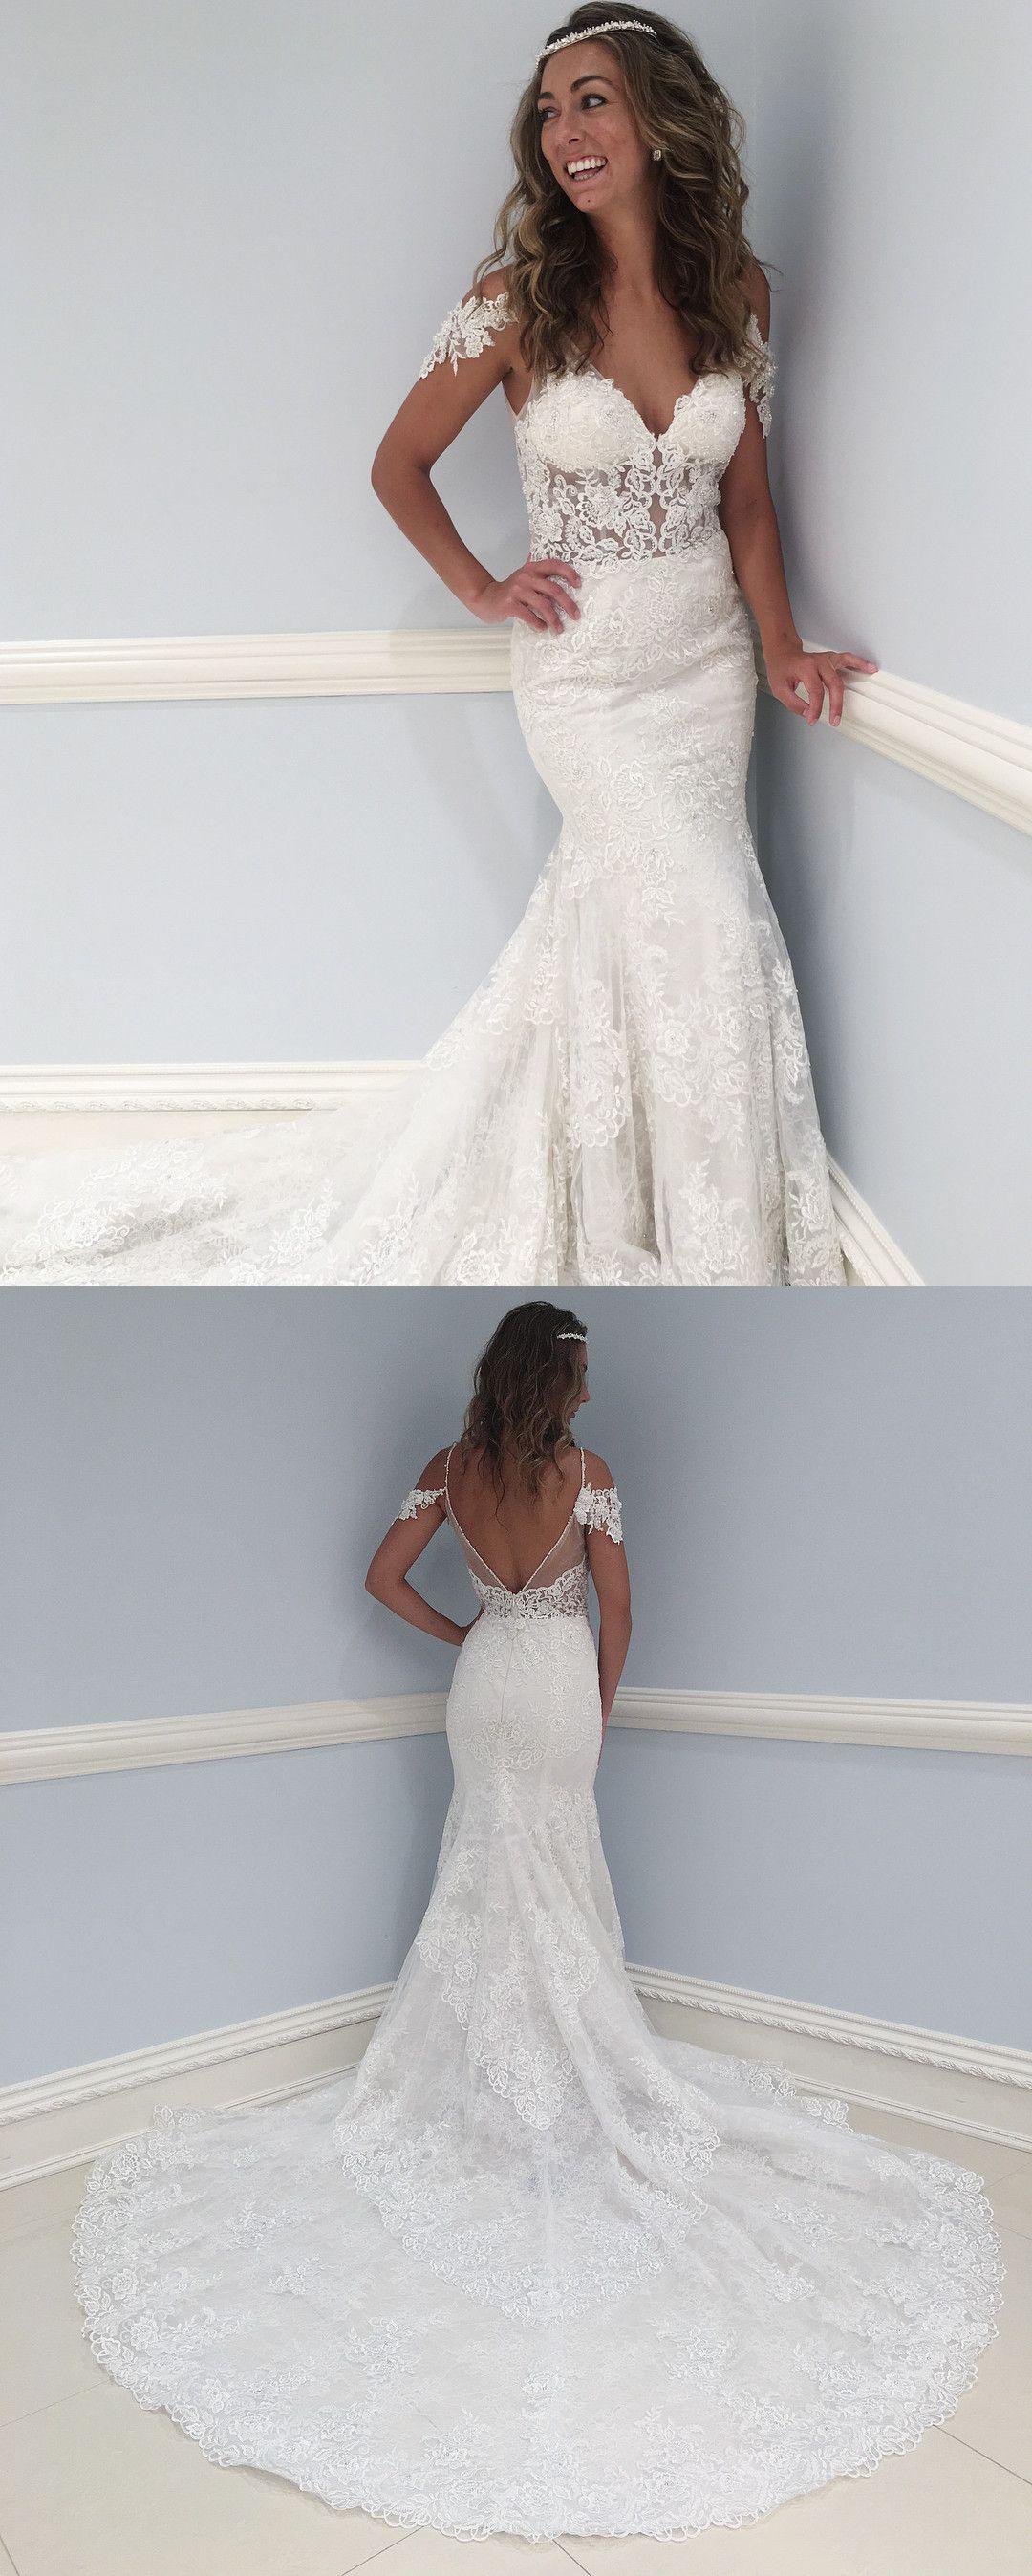 Fancy V Neck Lace Long Wedding Dress with Train | Long wedding ...